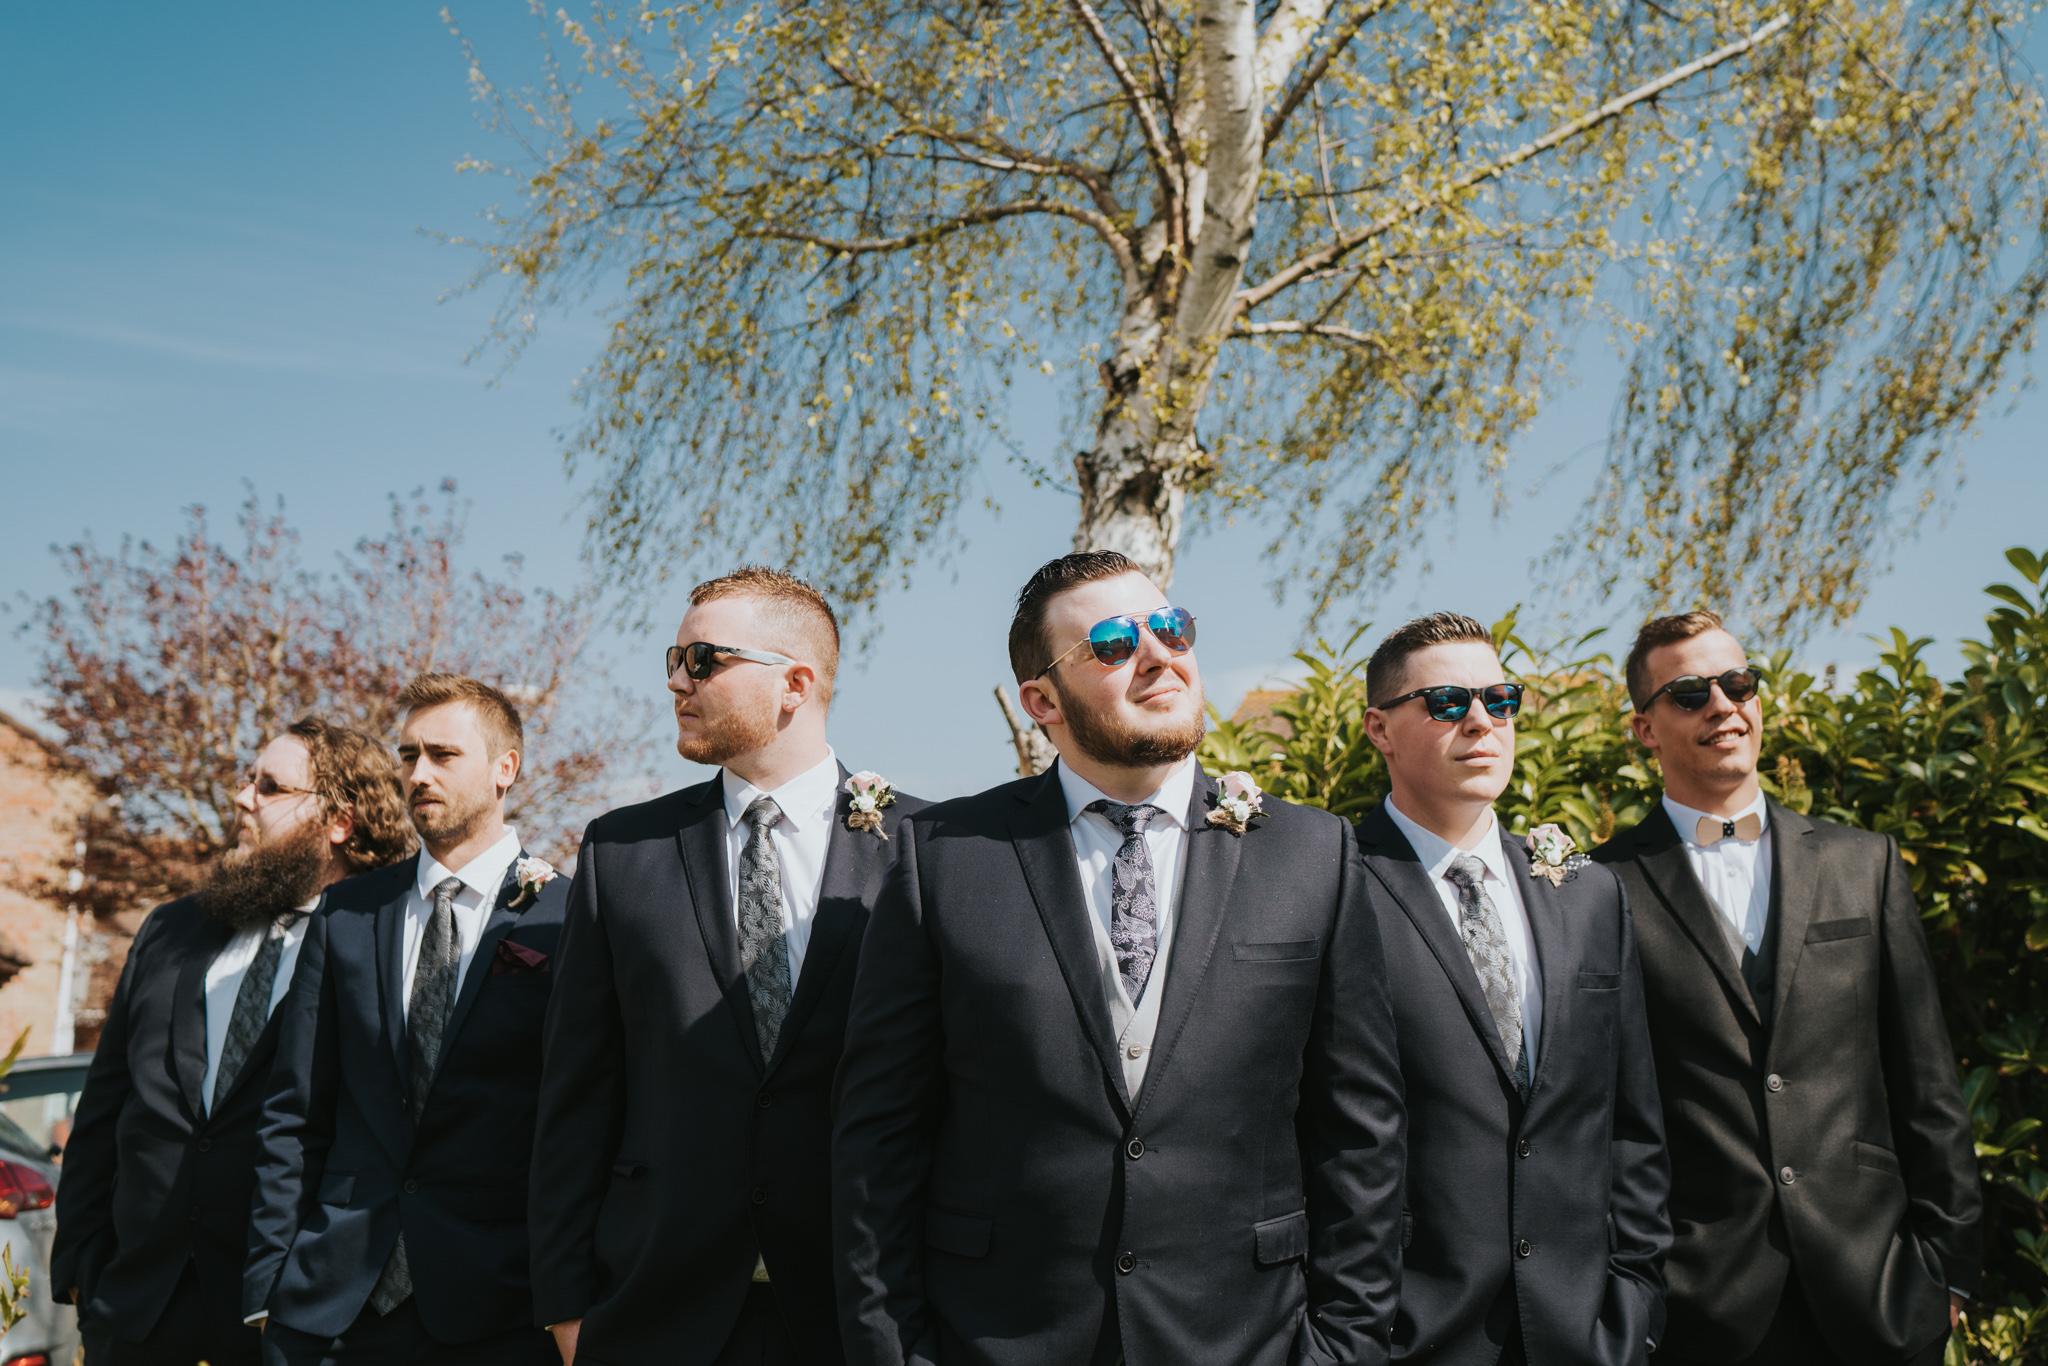 grace-sam-old-barn-clovelly-devon-wedding-photographer-grace-elizabeth-essex-suffolk-norfolk-wedding-photographer (21 of 132).jpg